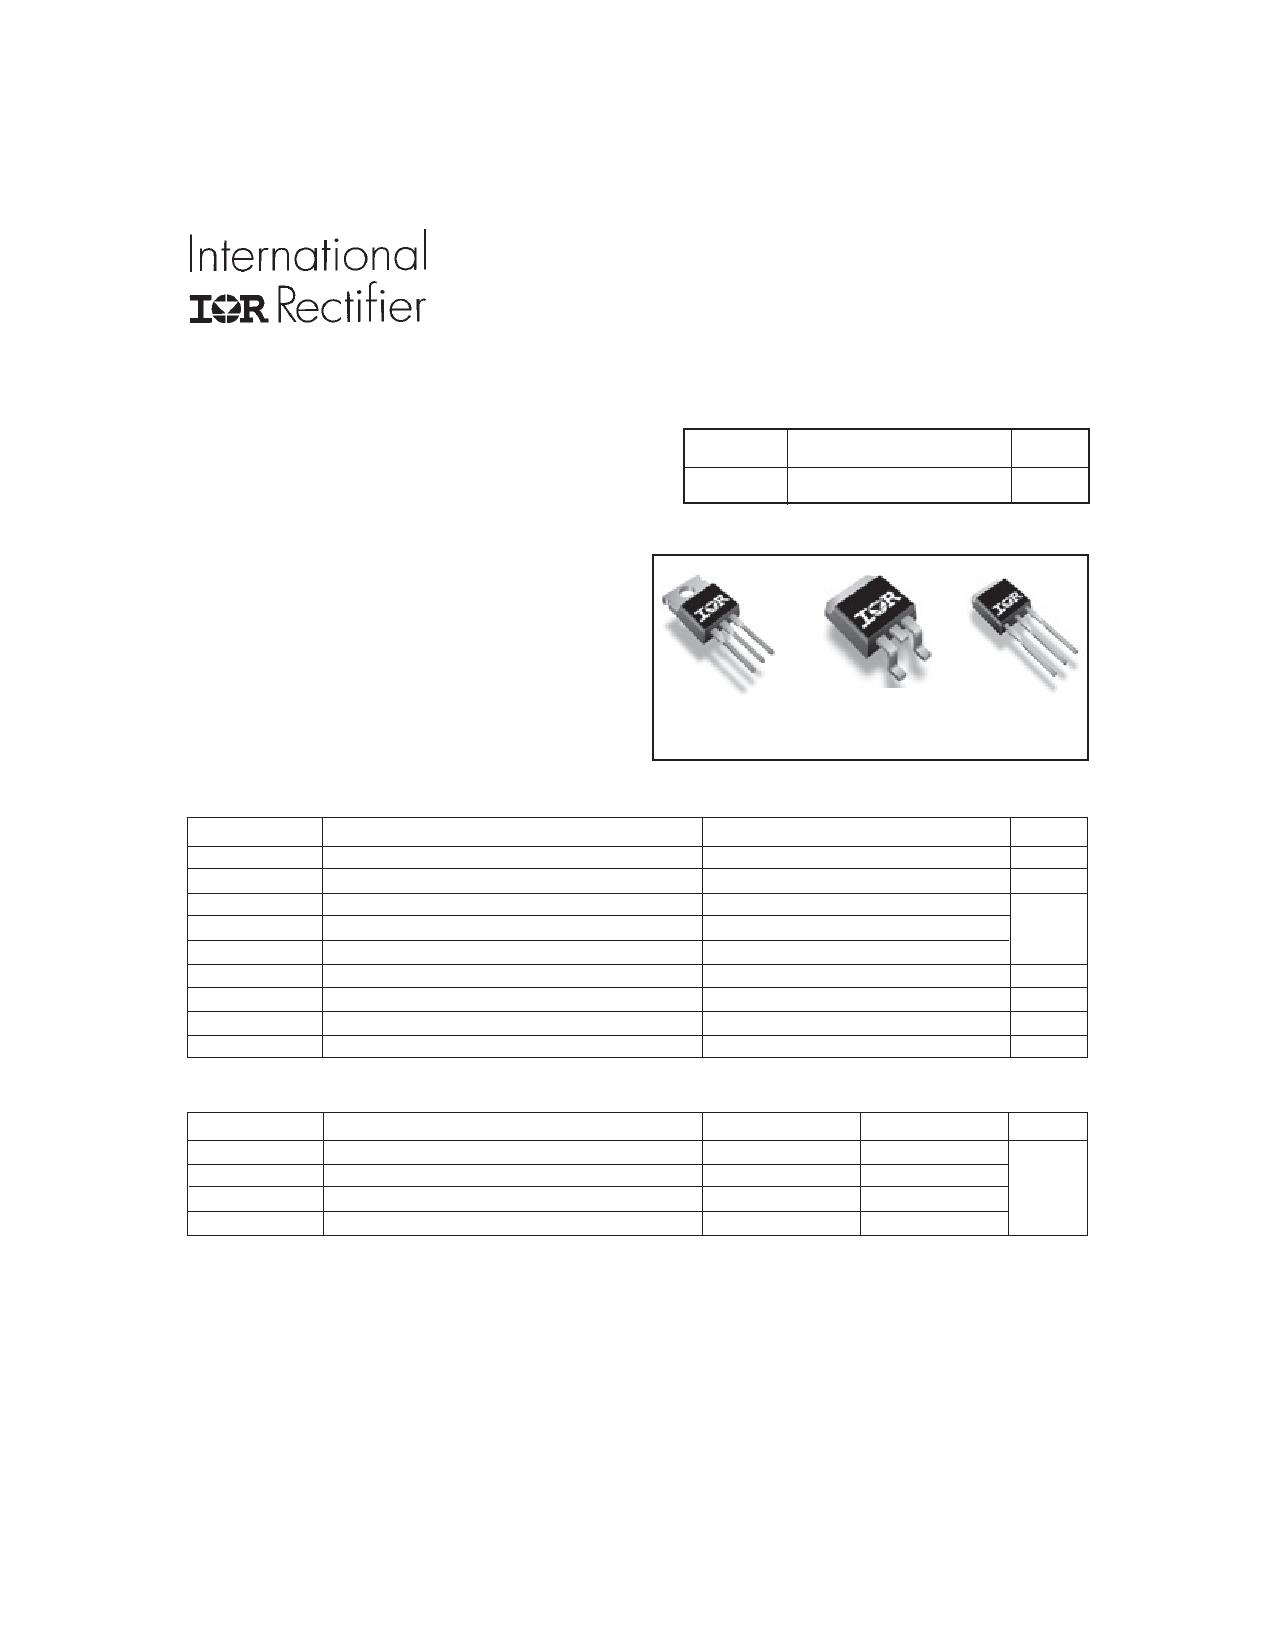 IRL3714LPbF Datasheet, IRL3714LPbF PDF,ピン配置, 機能